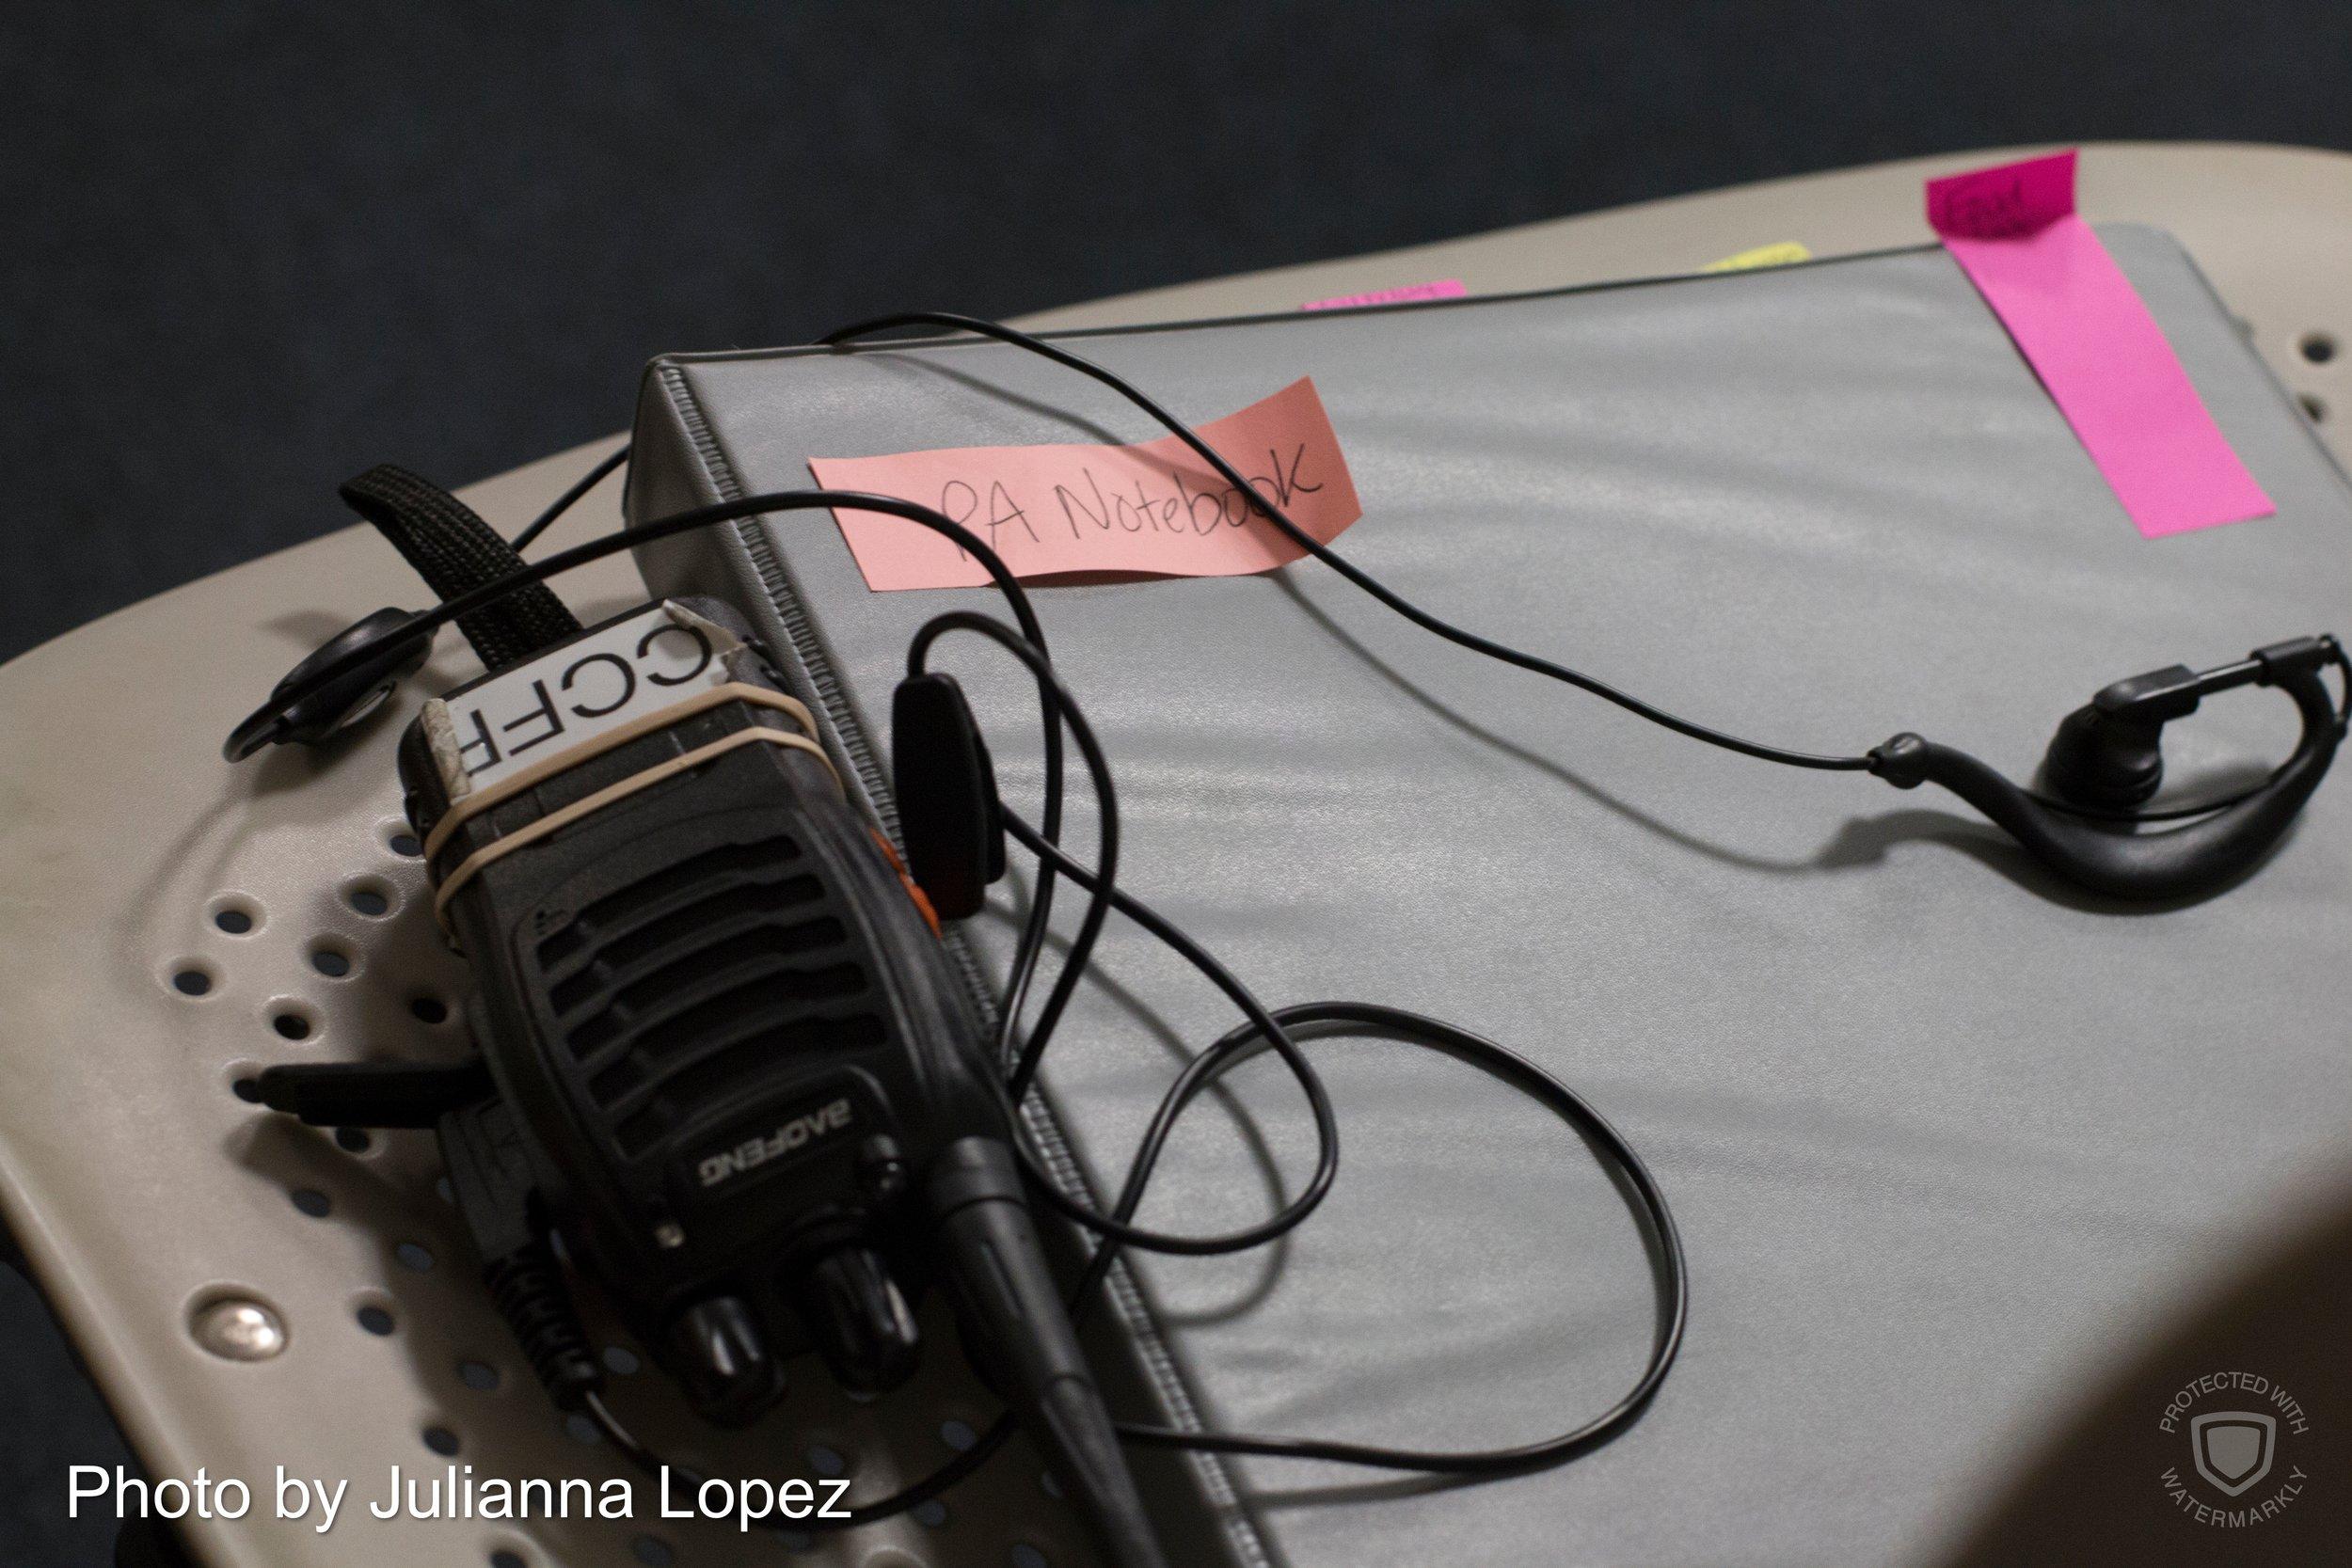 Julianna Lopez - IMG_6295.jpg